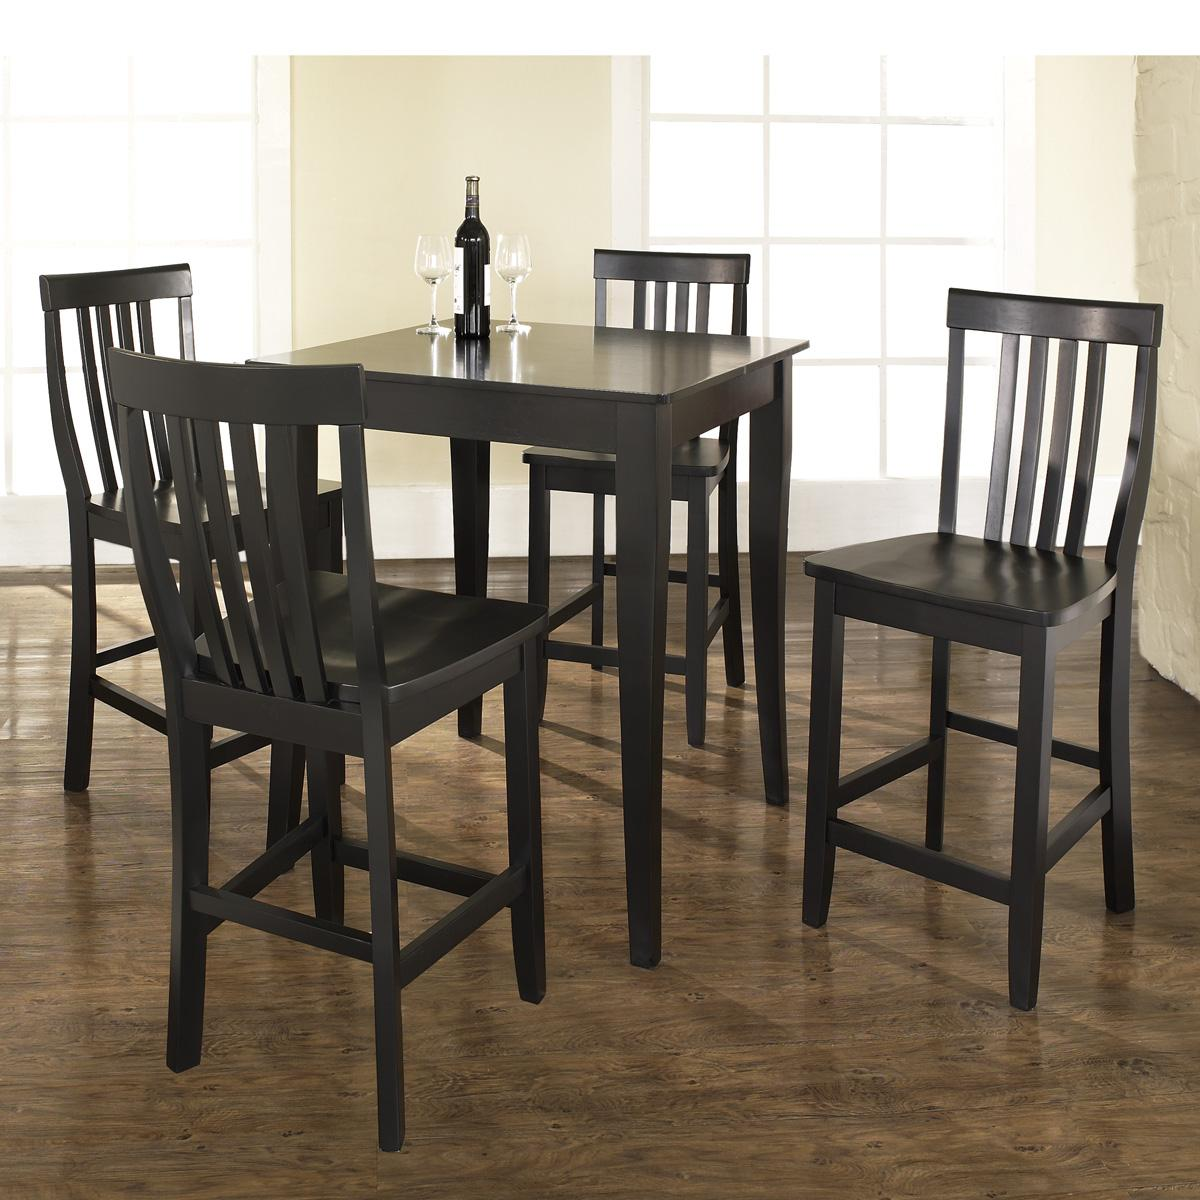 Black Pub Dining Set: 5 Piece Pub Dining Set With Cabriole Leg And School House